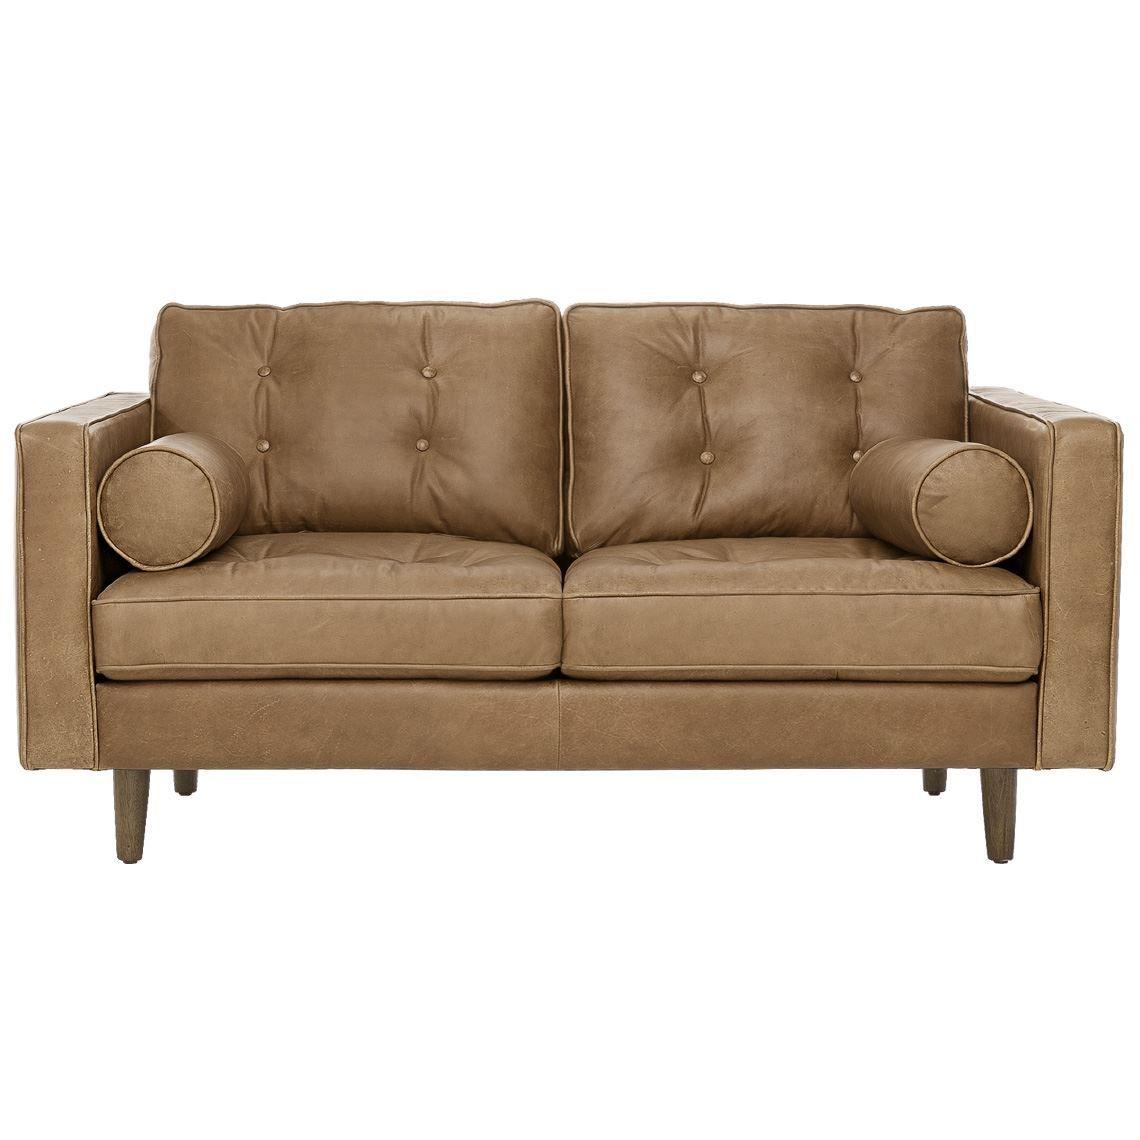 Copenhagen 2 Seat Leather Sofa Caramel Leather Sofa Sofa